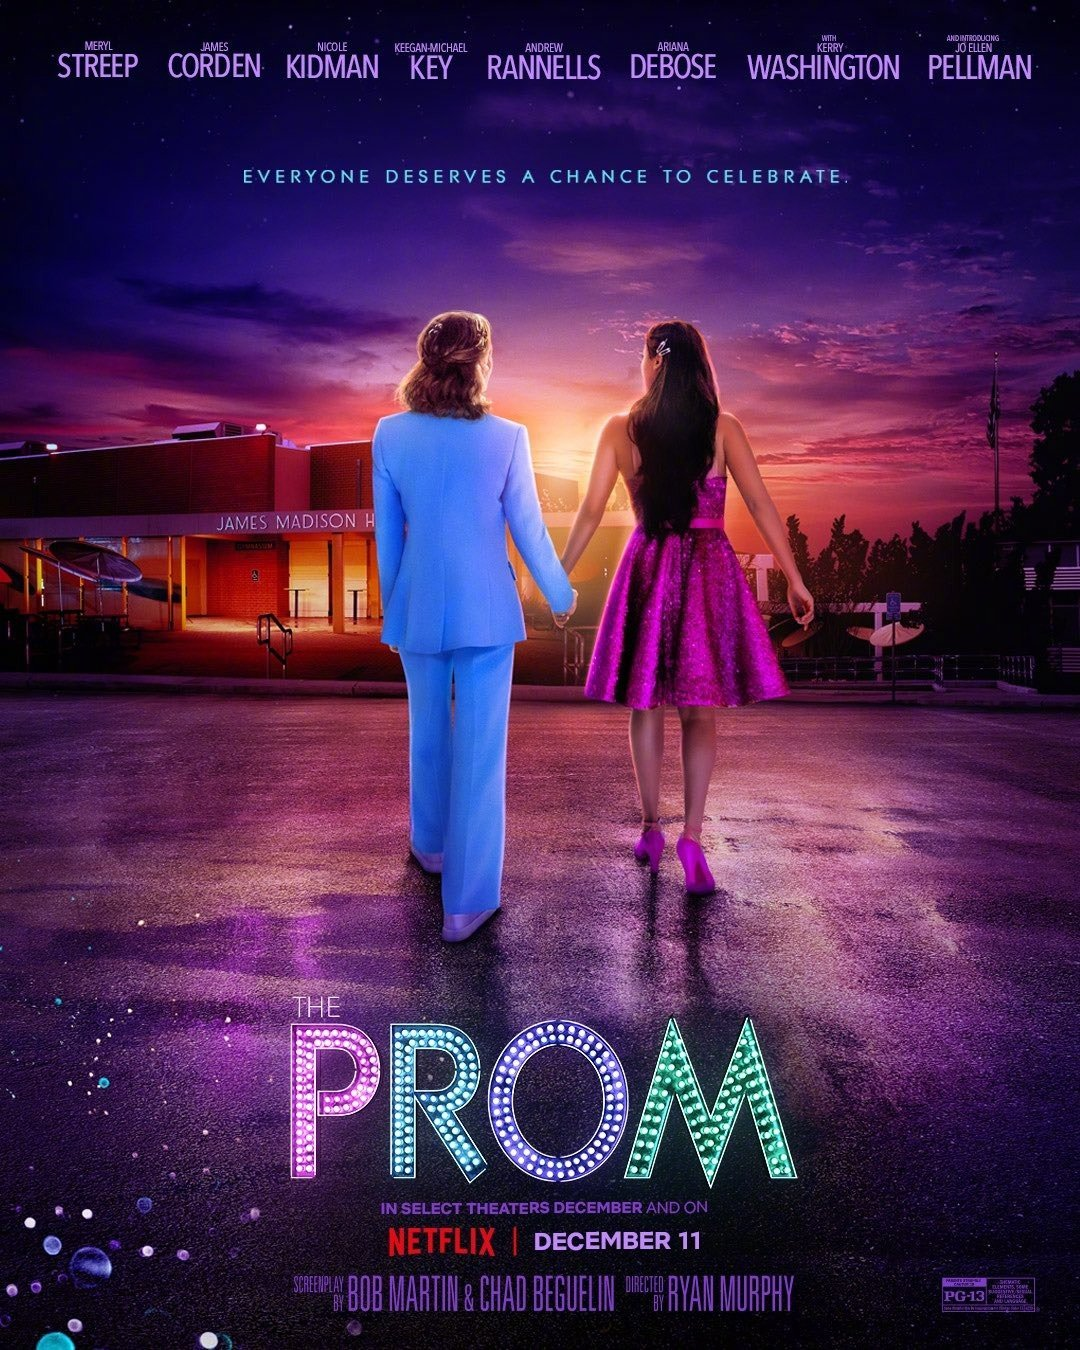 Netflix歌舞片《舞会》发布新海报!影片改编自百老汇同名音乐剧